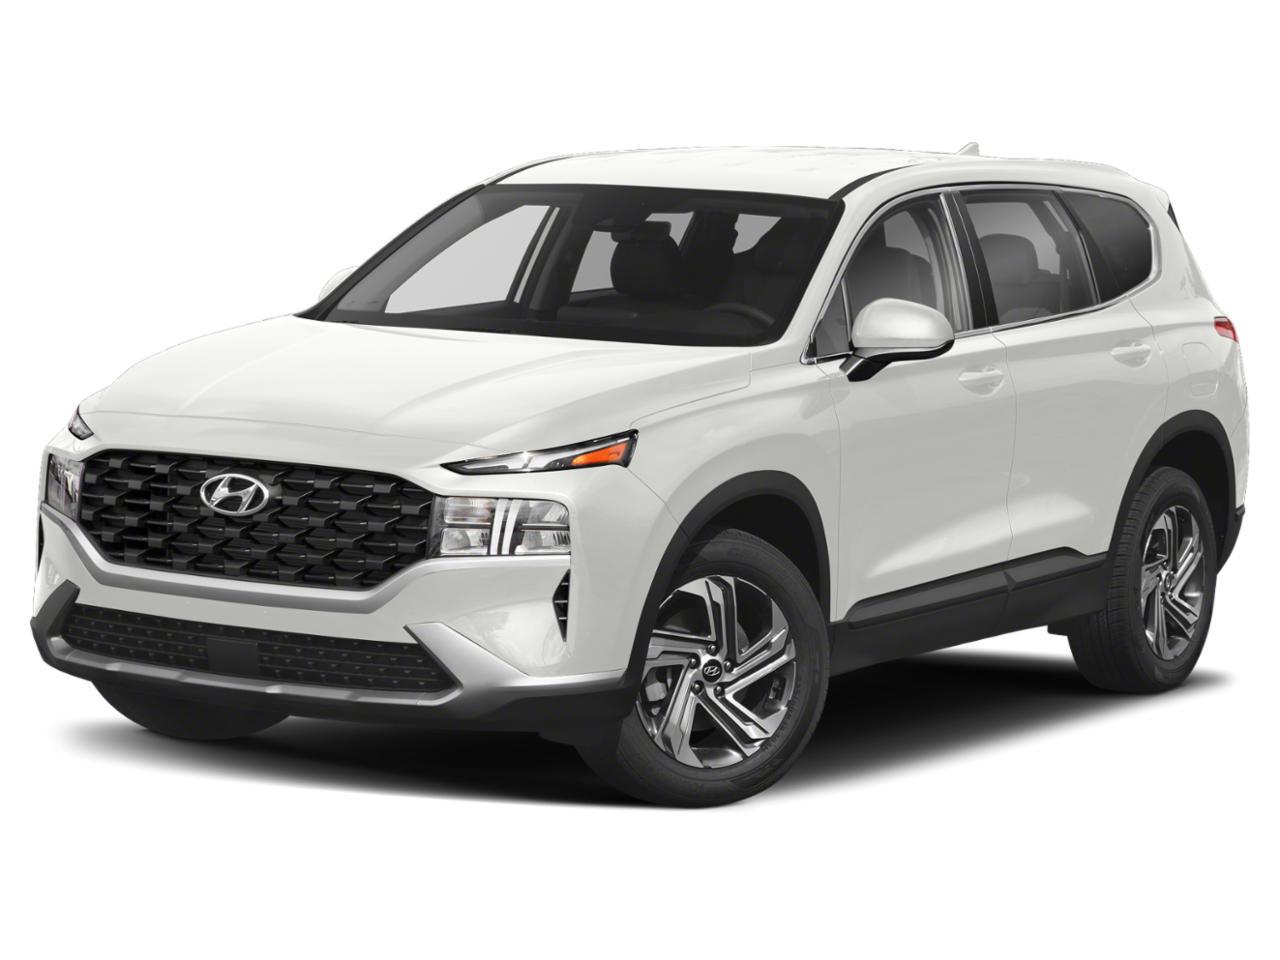 2021 Hyundai Santa Fe Vehicle Photo in Peoria, IL 61615